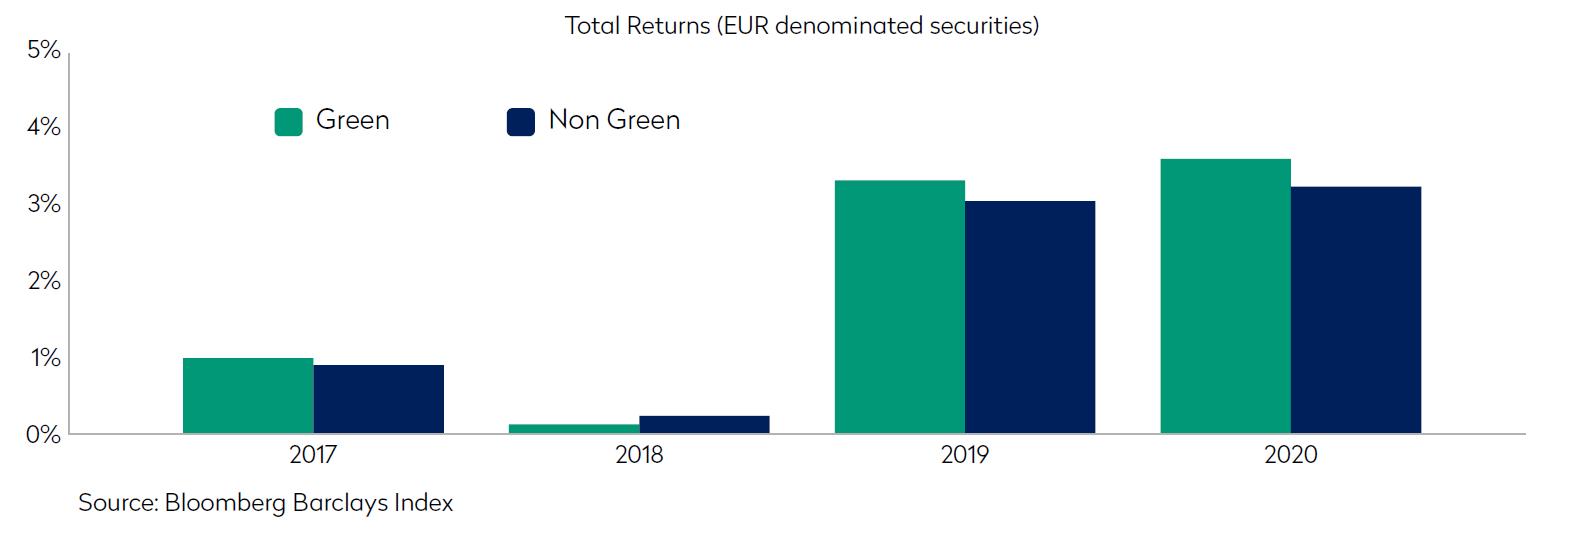 green bonds and non green bonds total returns